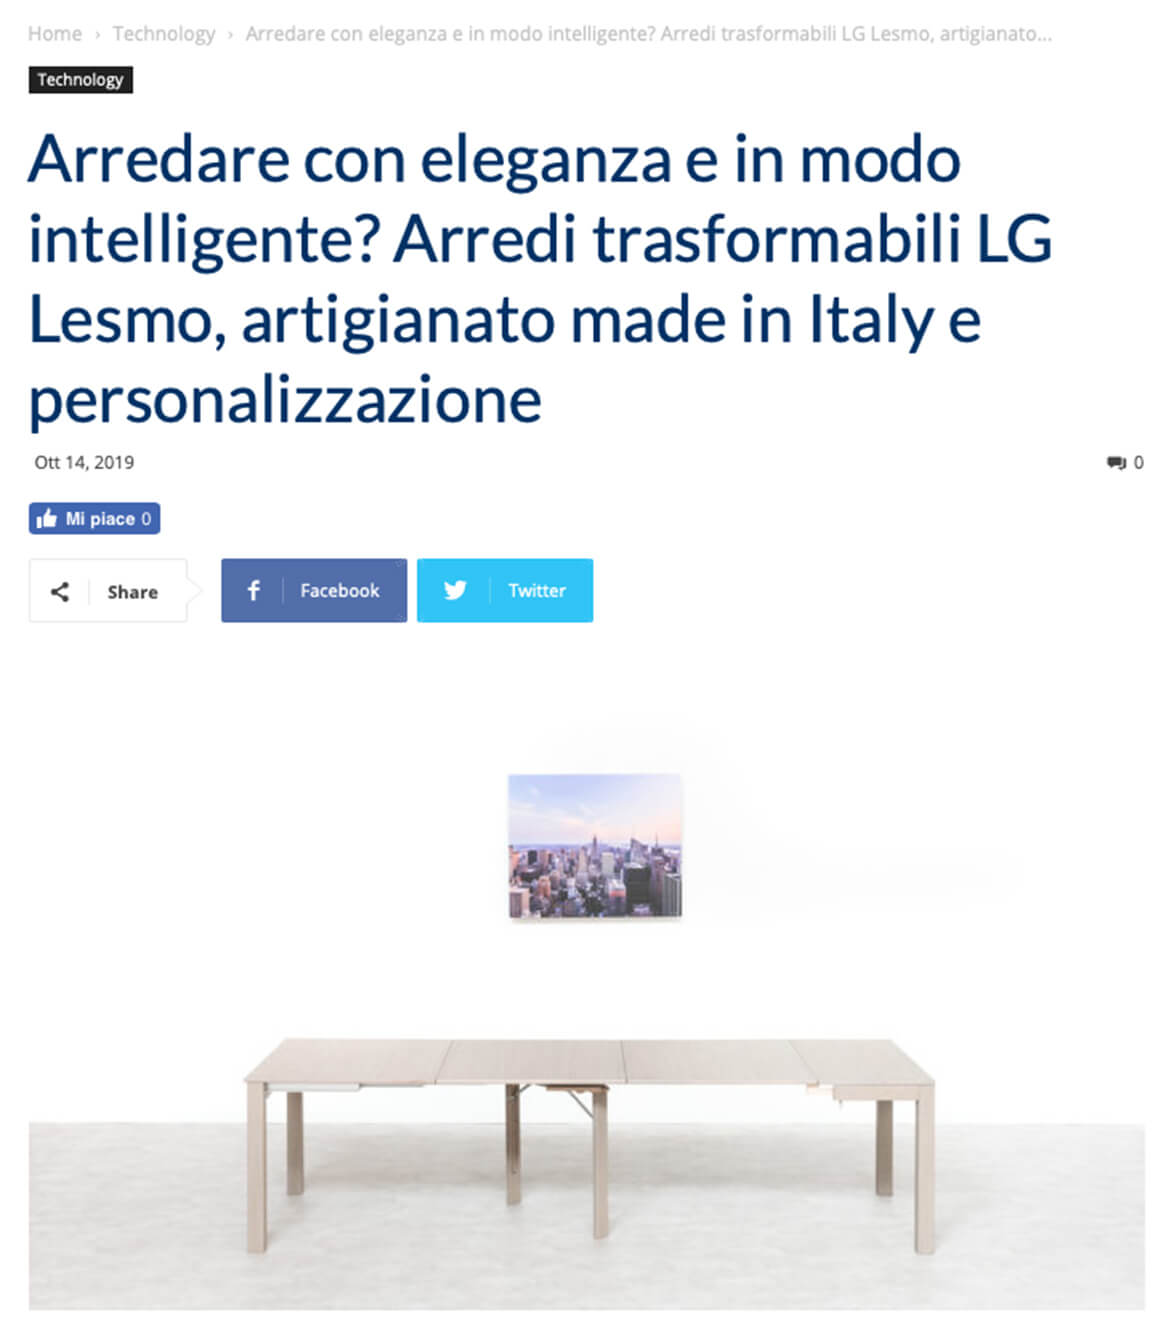 tavoli-allungabili-made-in-italy-2019_05.jpg